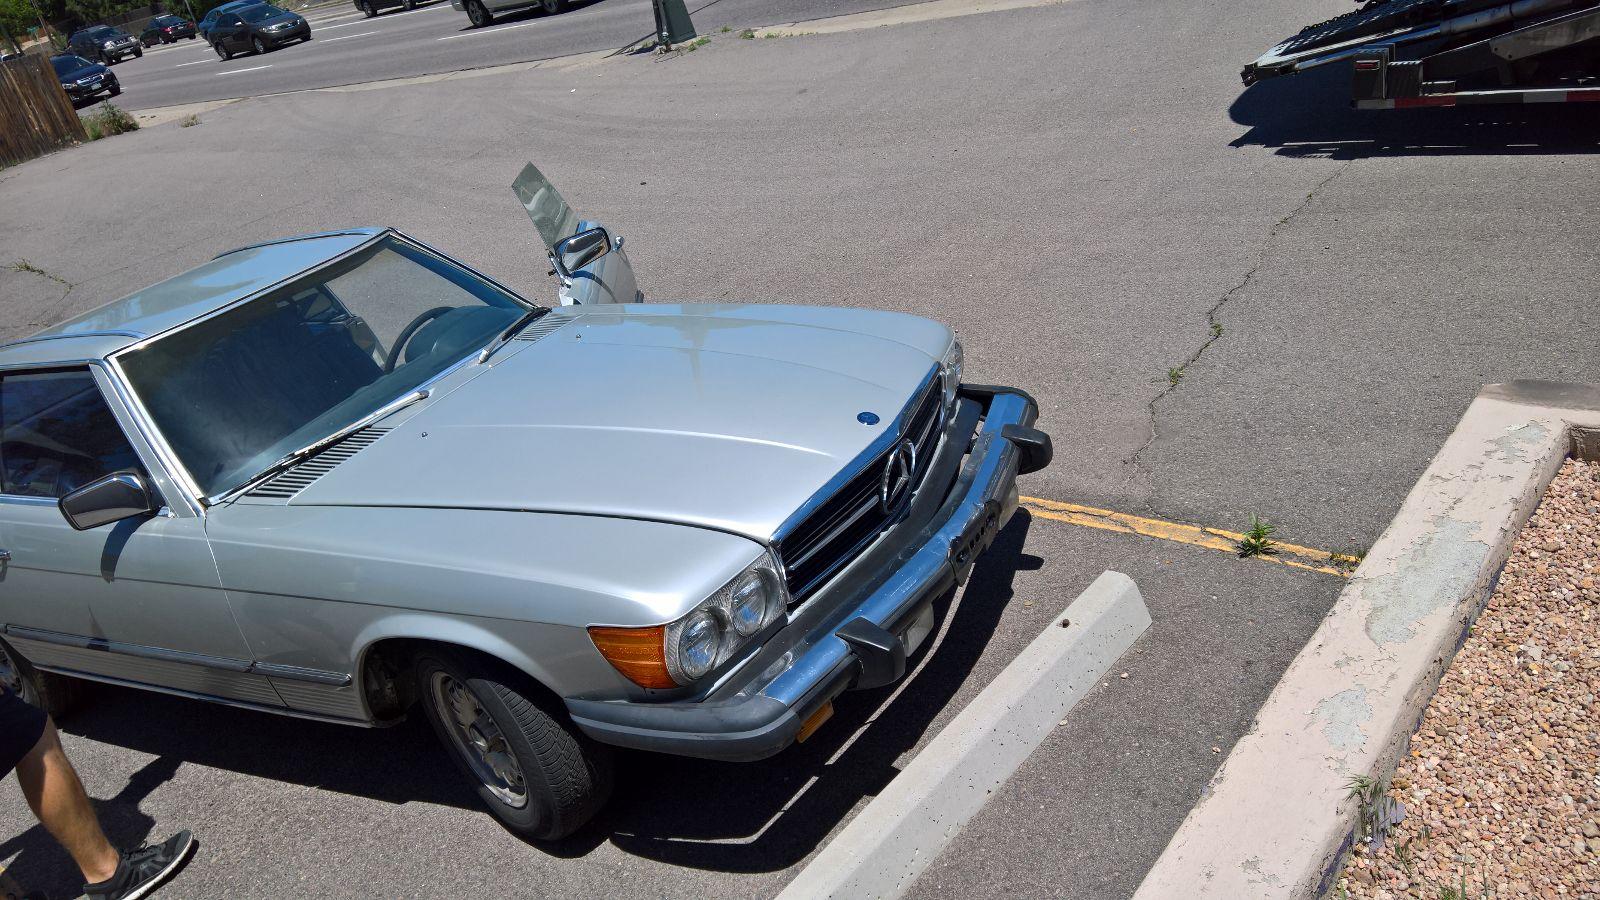 1977 mercedes benz 450 sl city center auto for Mercedes benz 450 sl